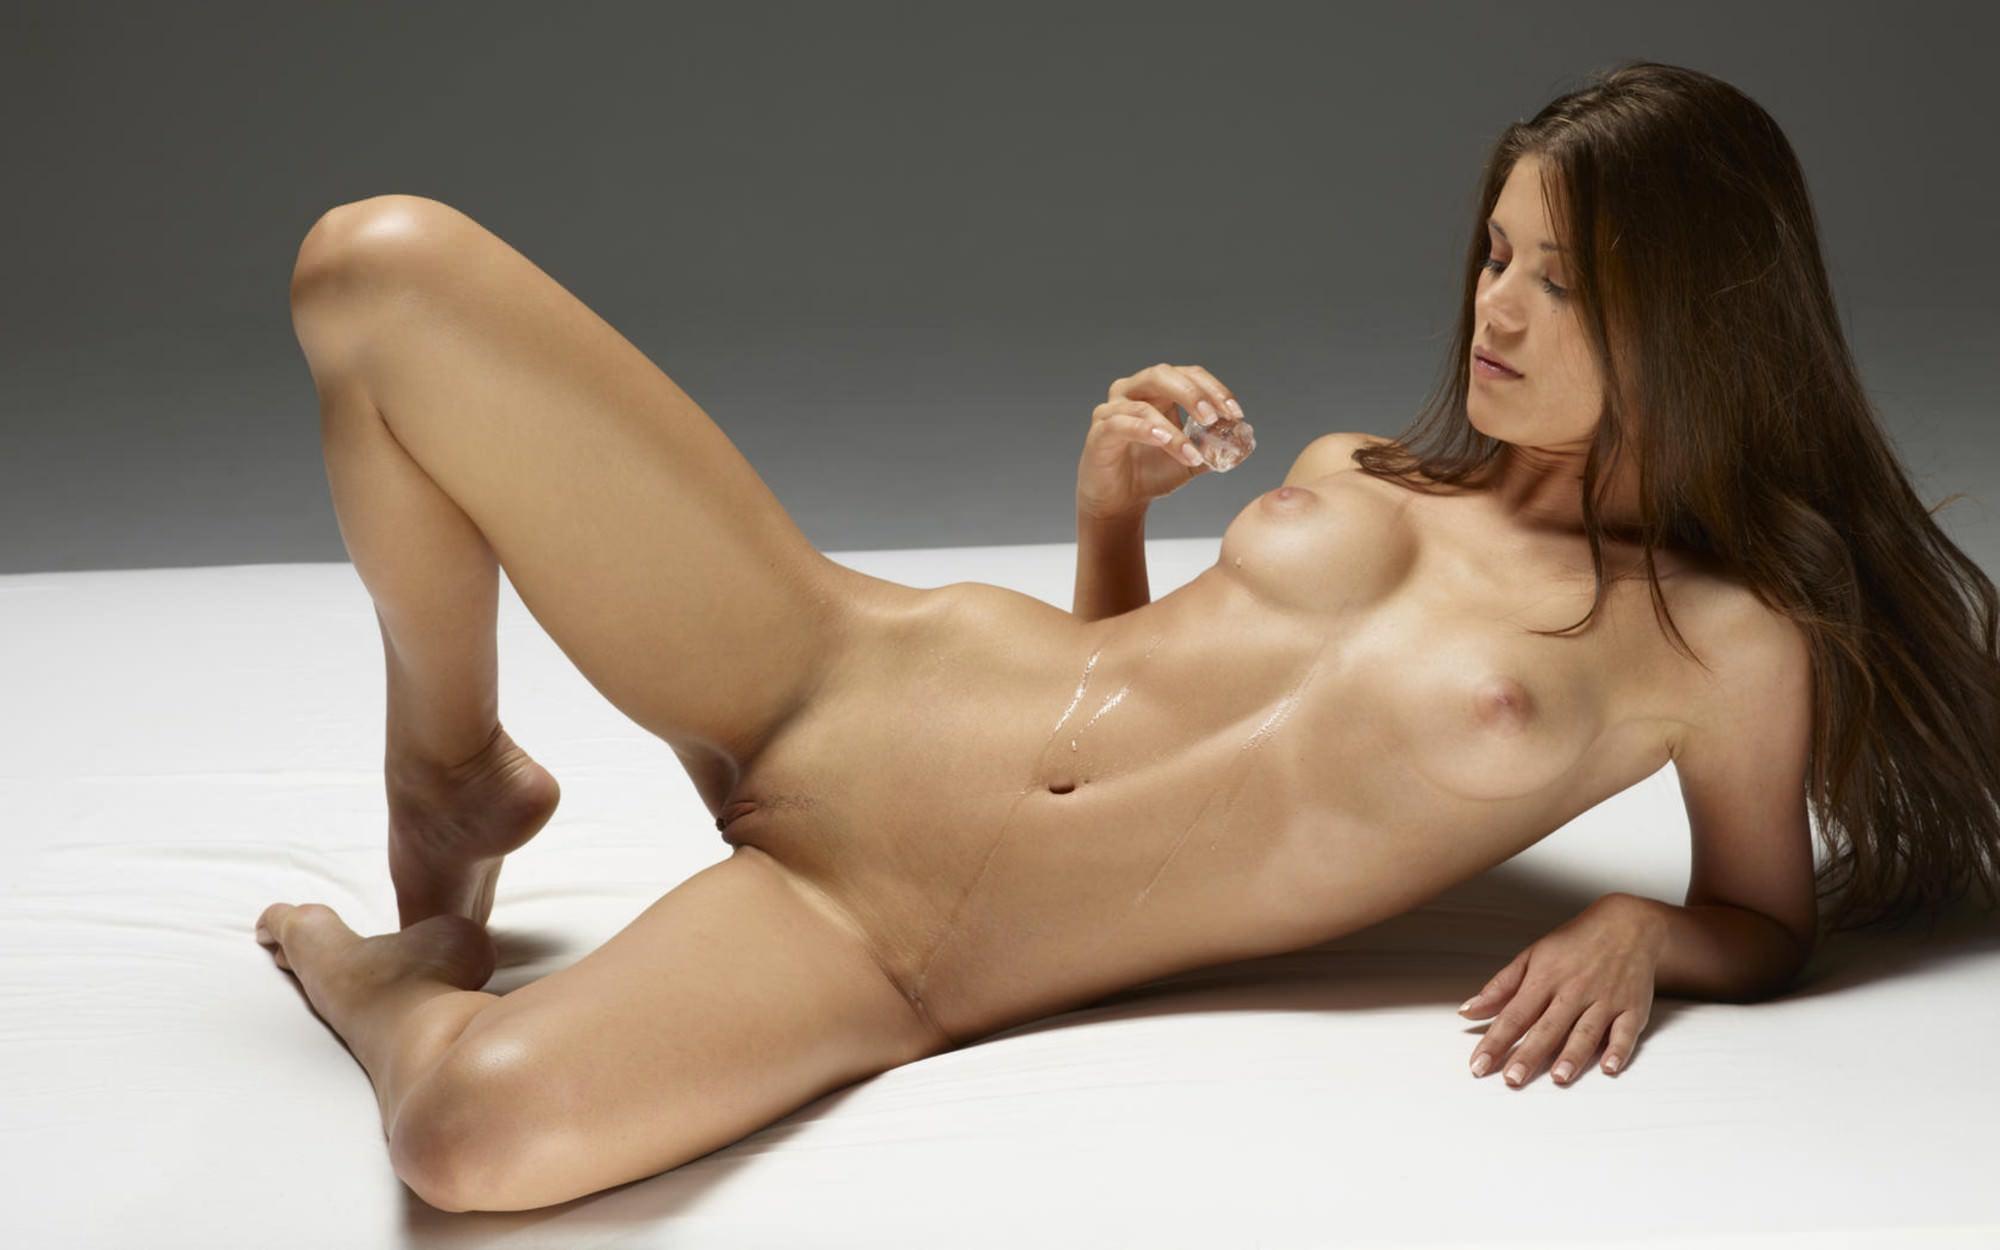 голая девушка на фоне самолета